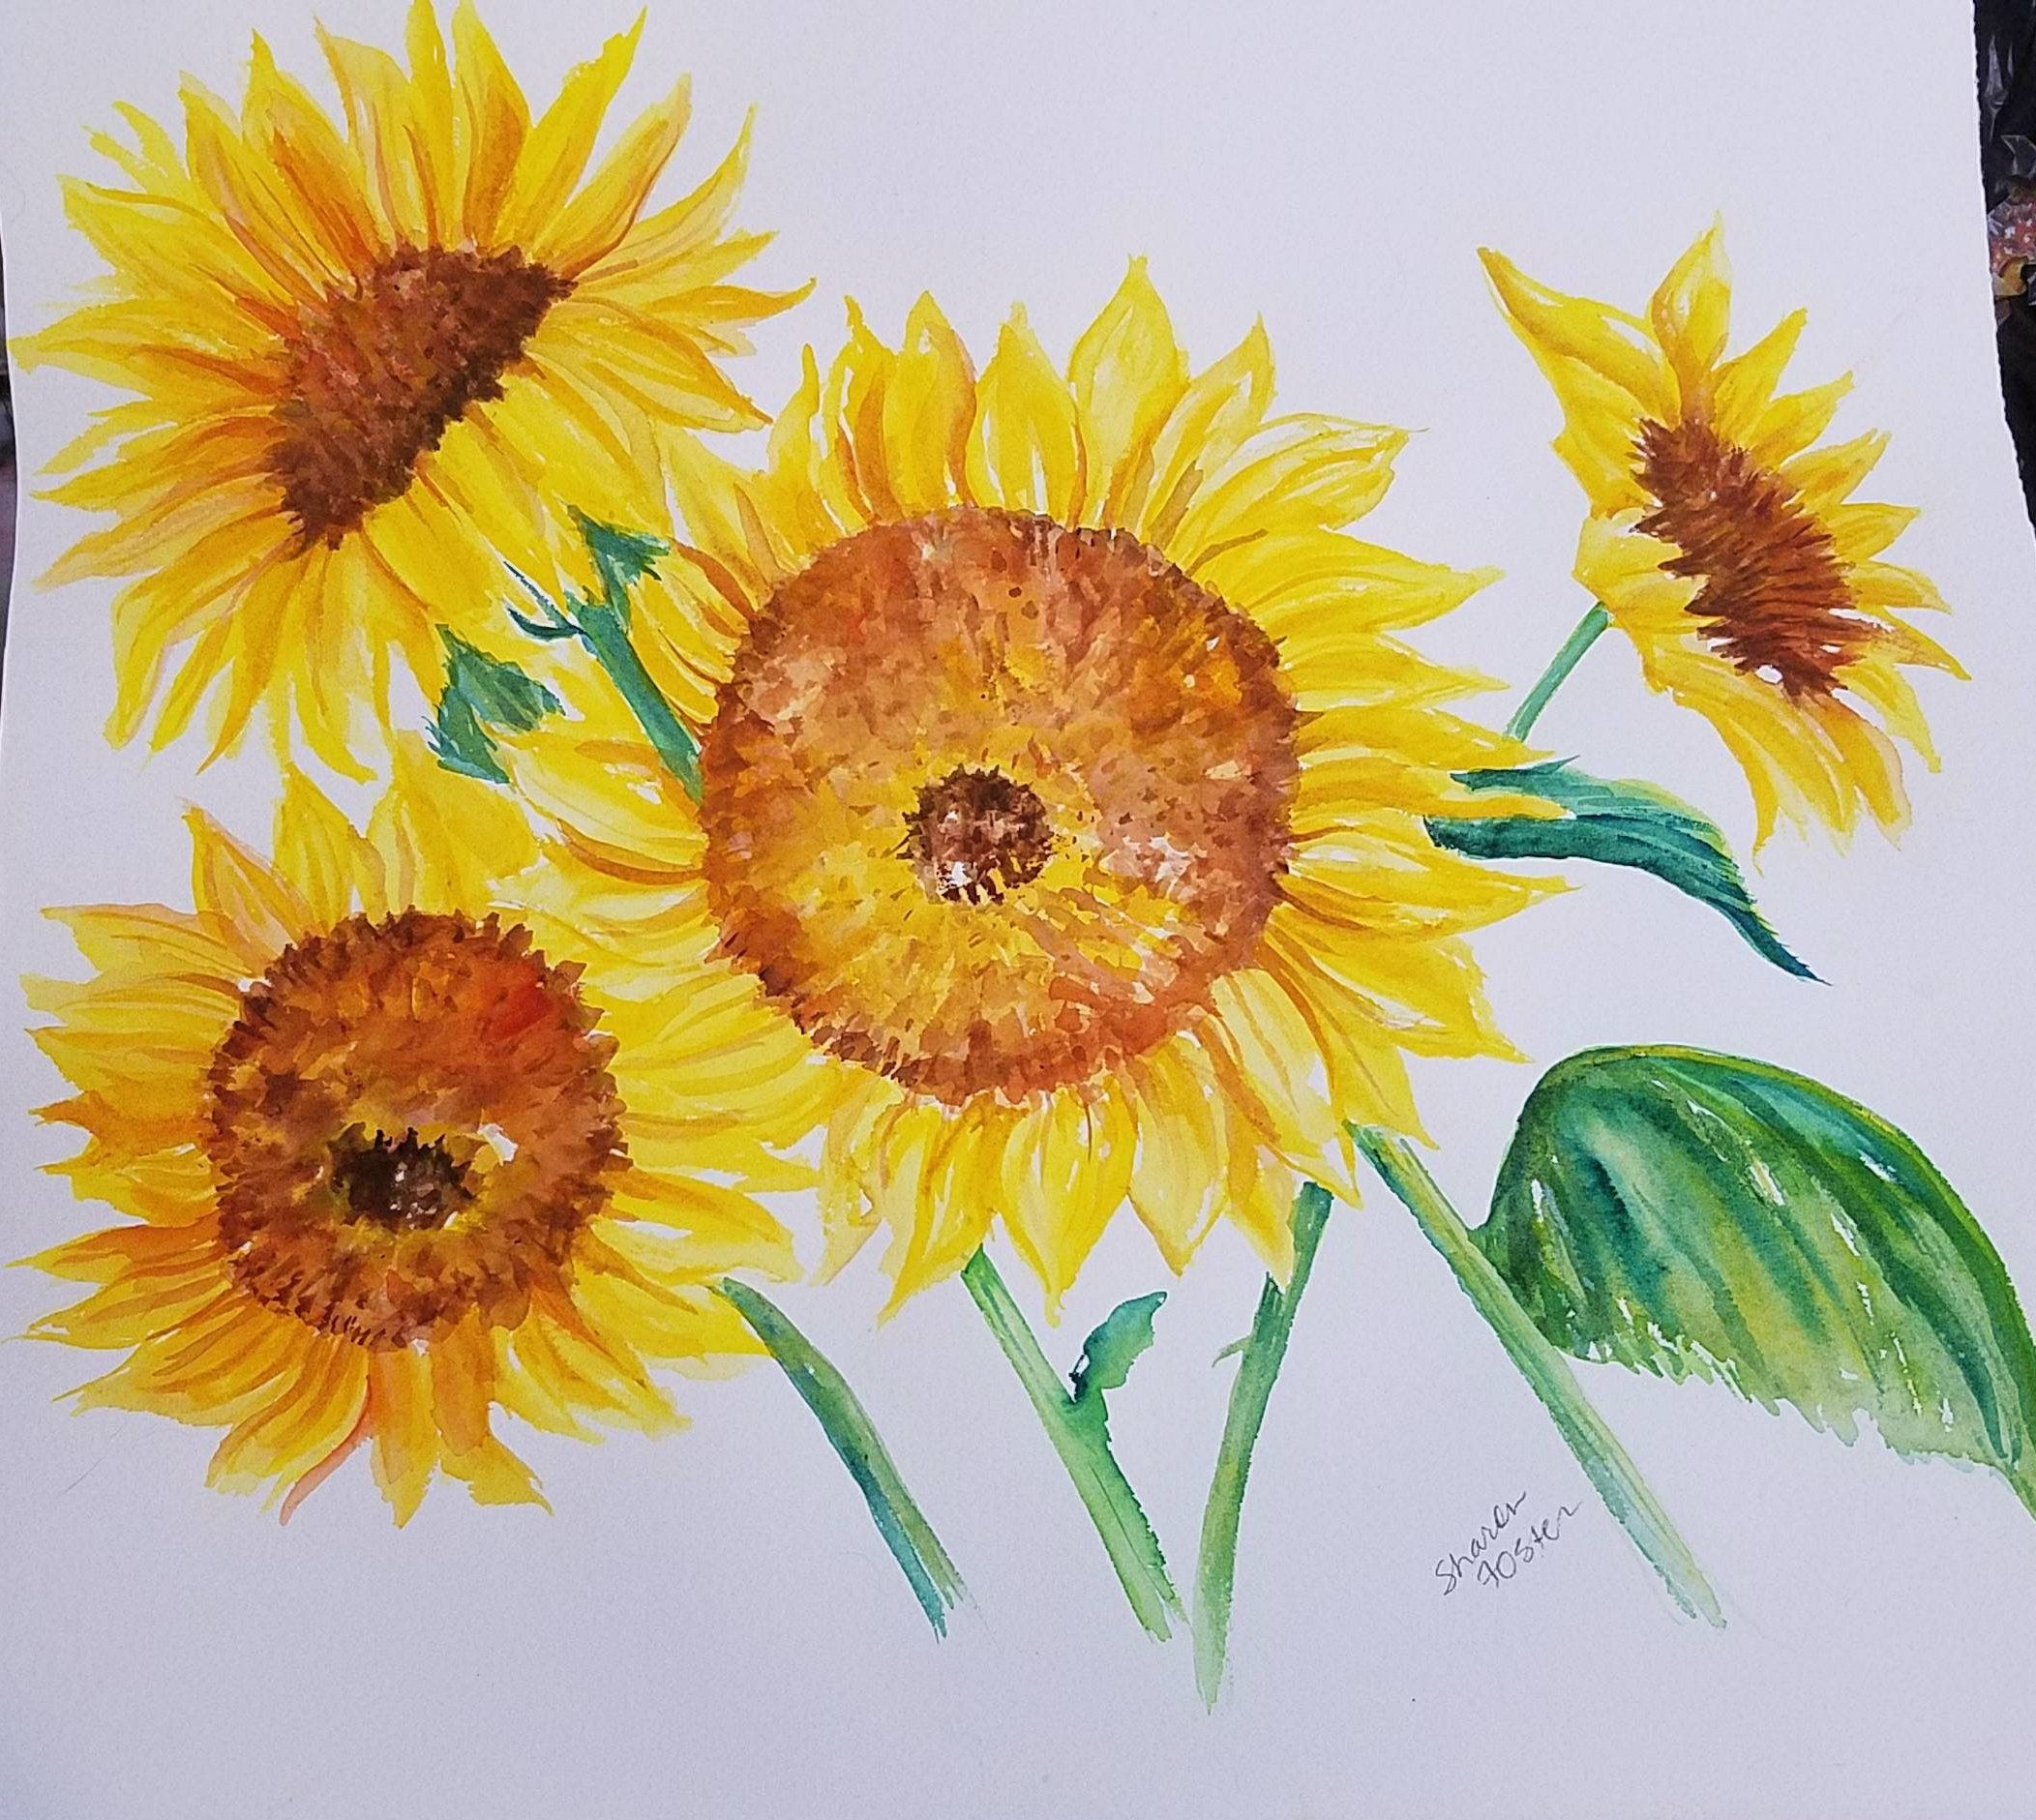 Sunflowers Watercolors Paintings Original 16 x 15 sunflowers ...